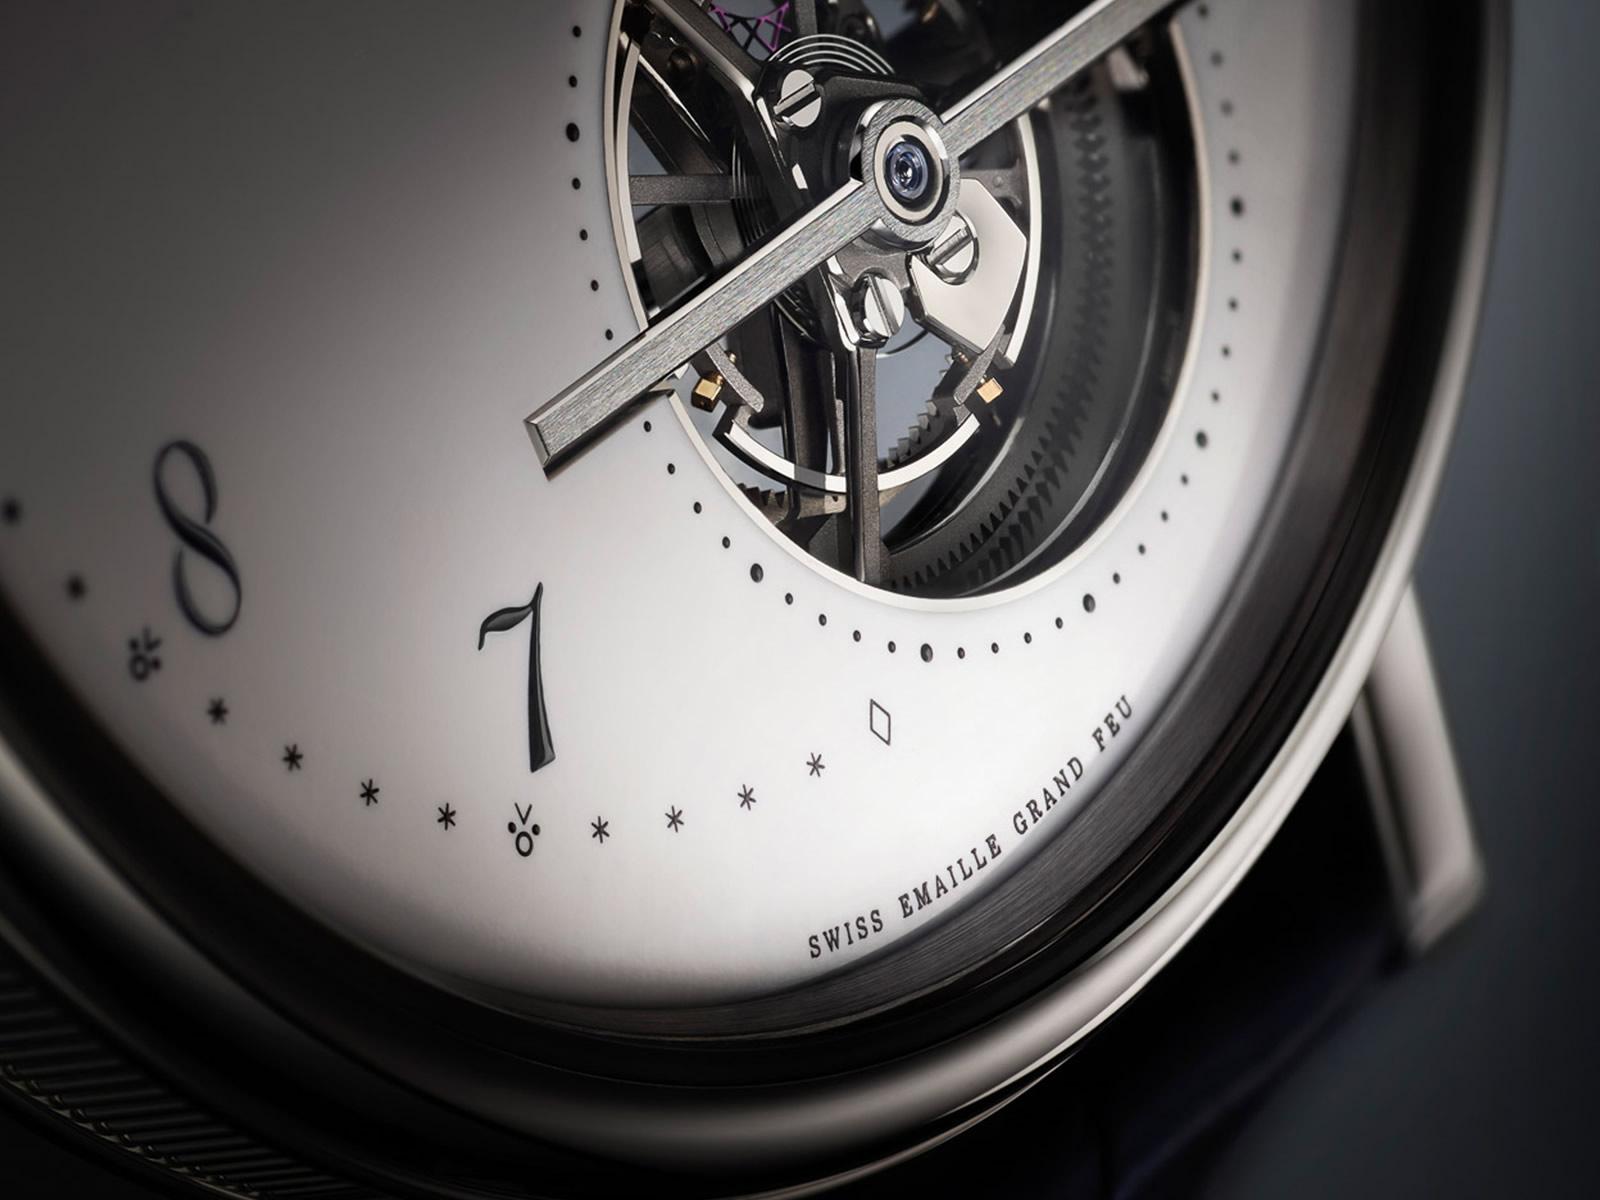 breguet-classique-tourbillon-extra-plat-automatique-5367-5-.jpg